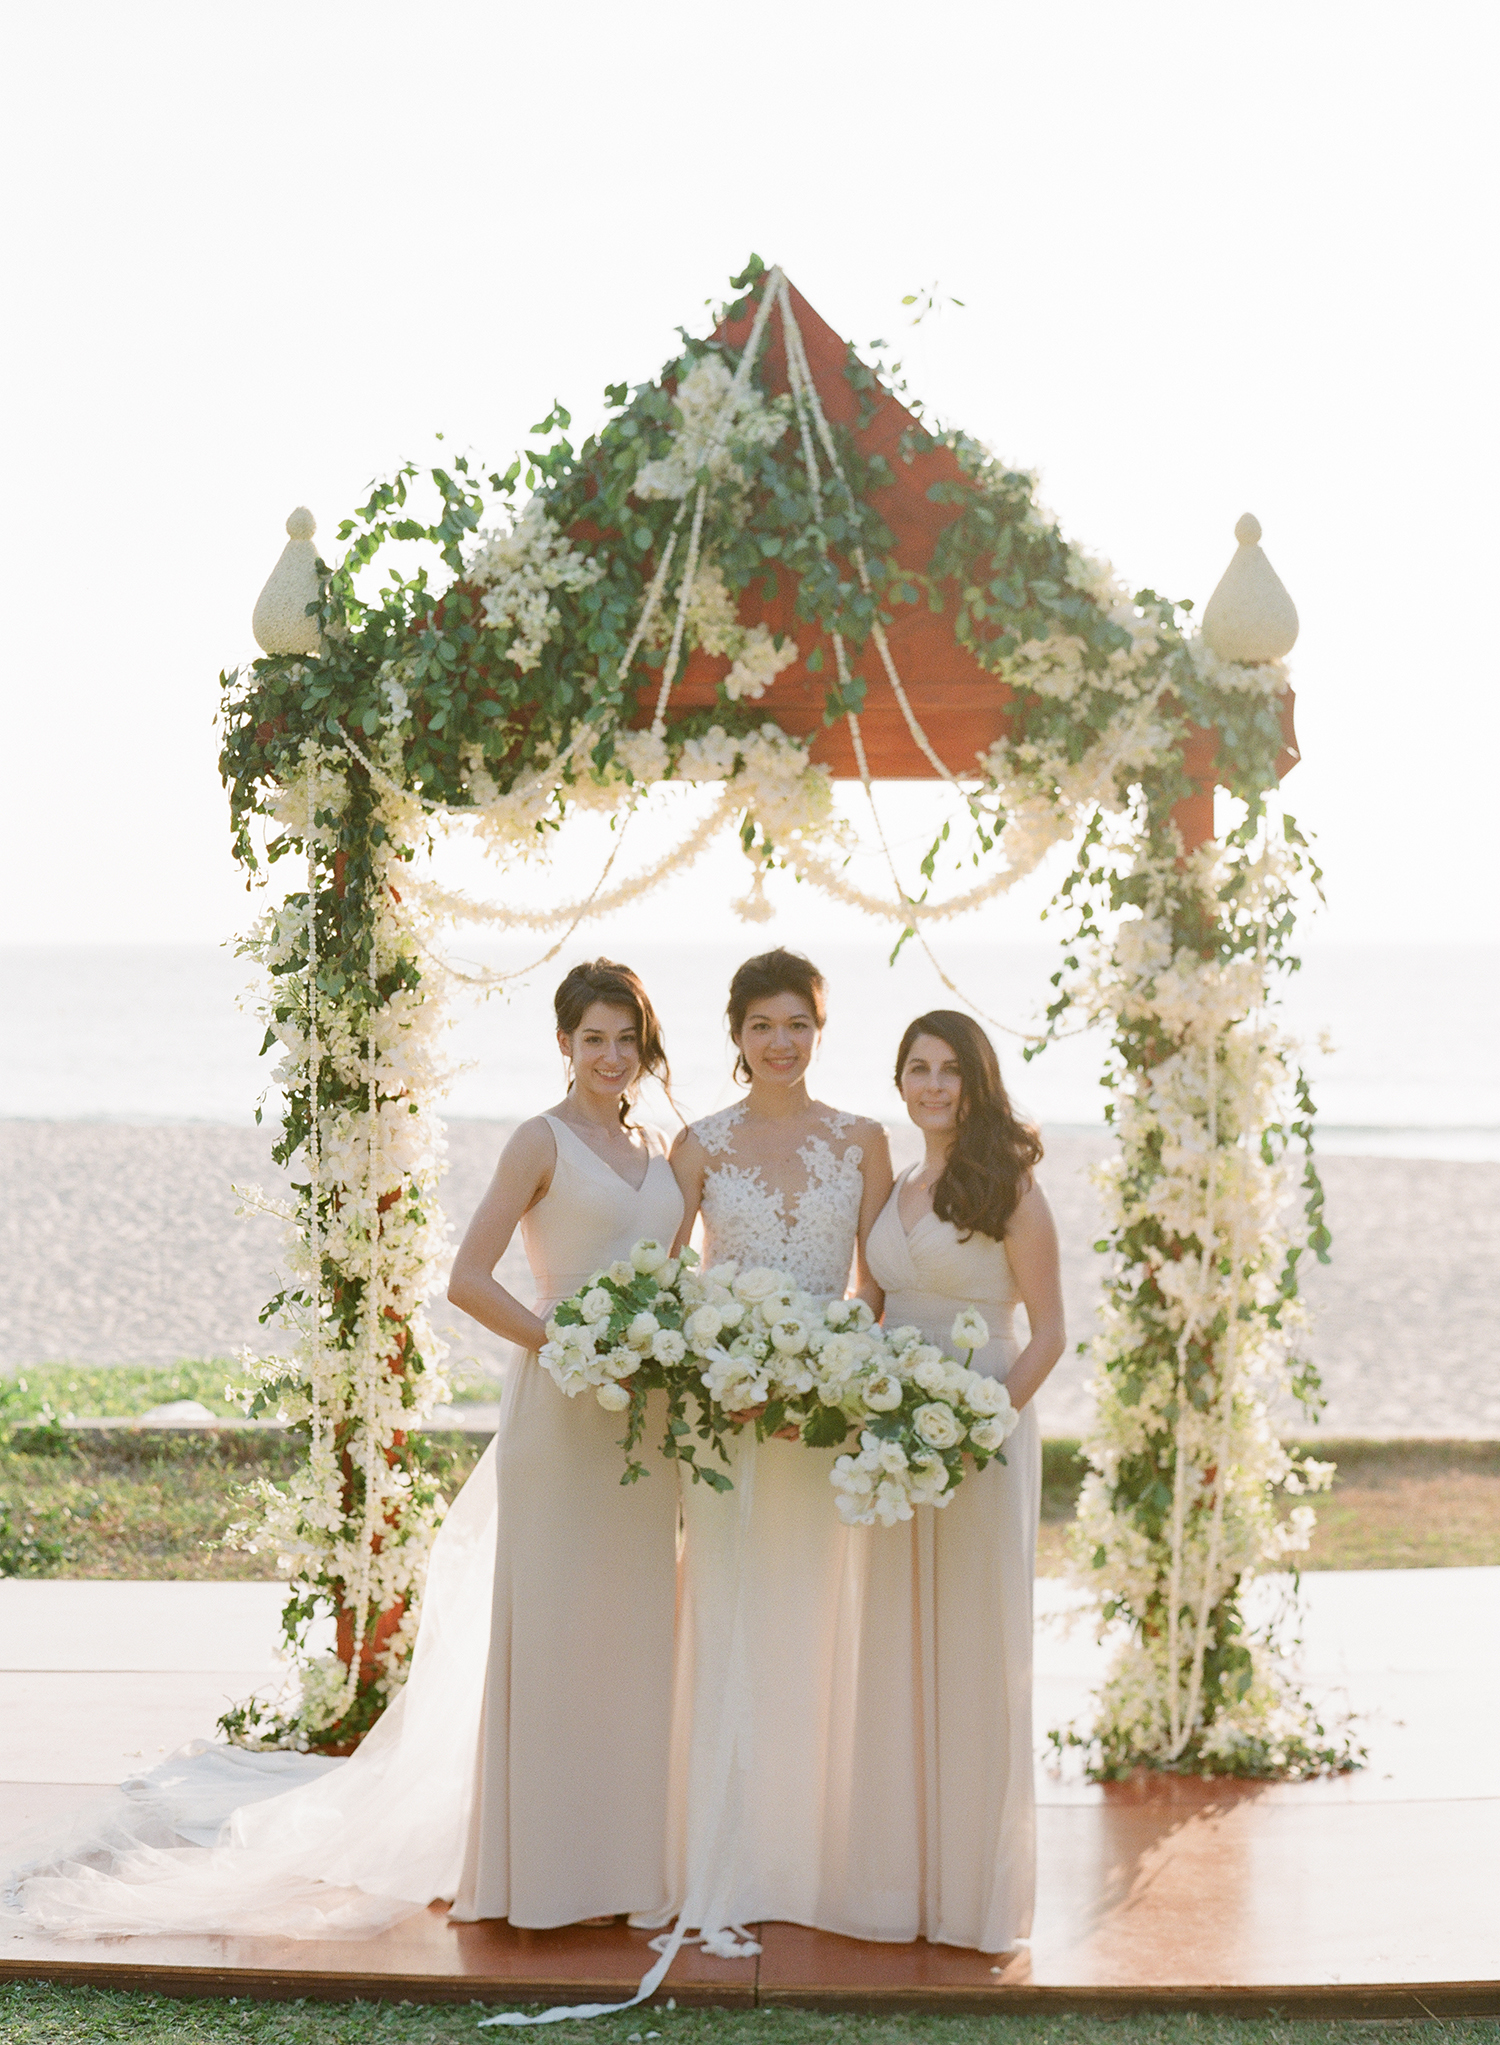 stacy brad wedding thailand bridesmaids under arch on the beach